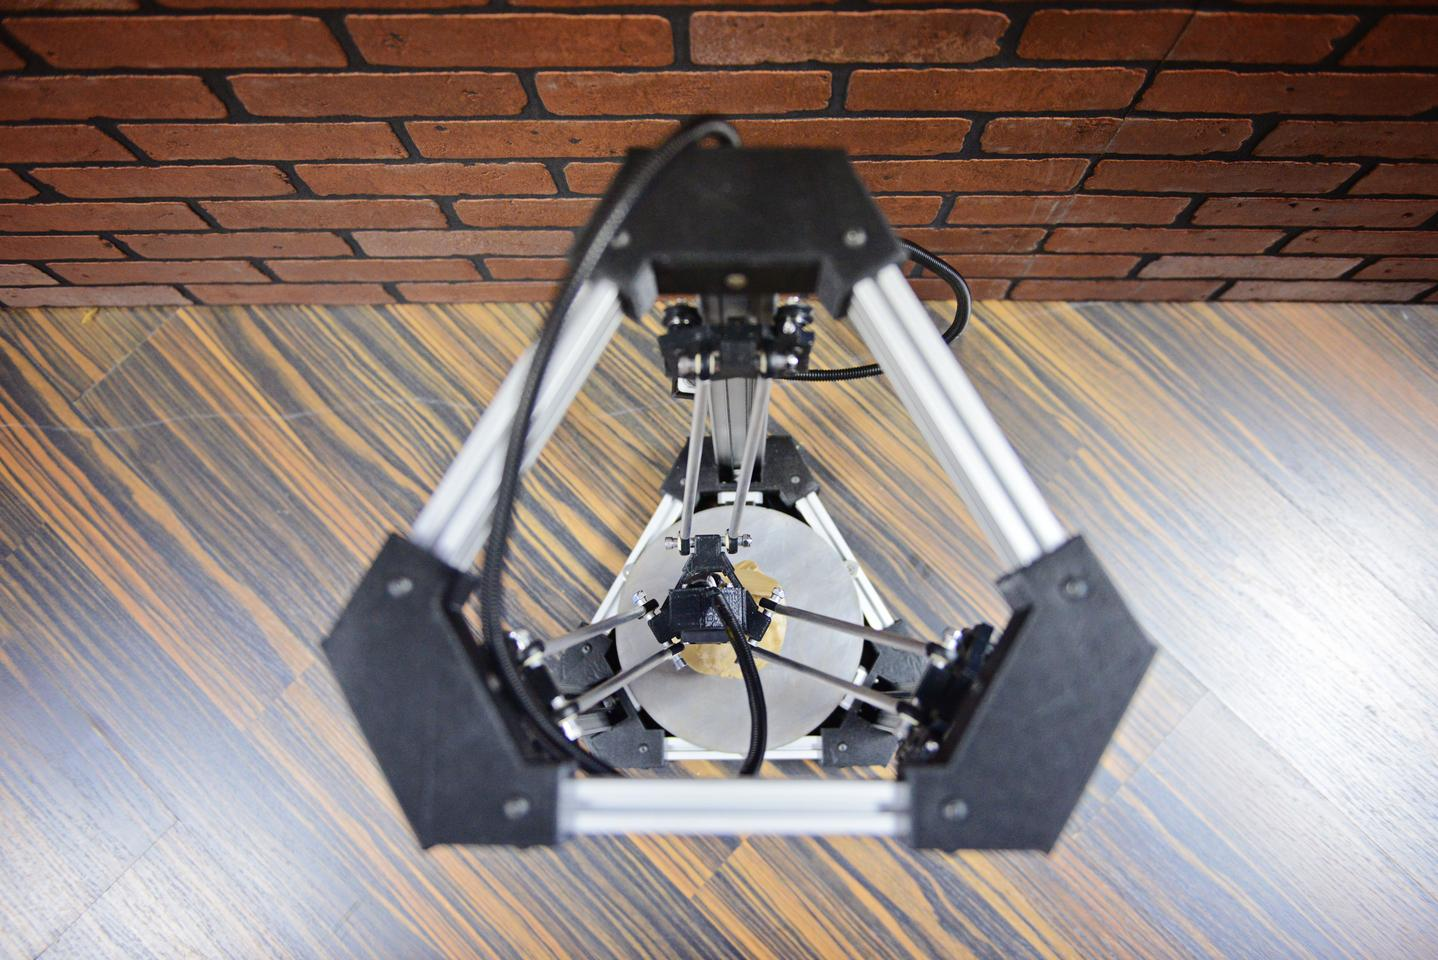 The DeltaMaker 3D printer features a striking symmetrical design